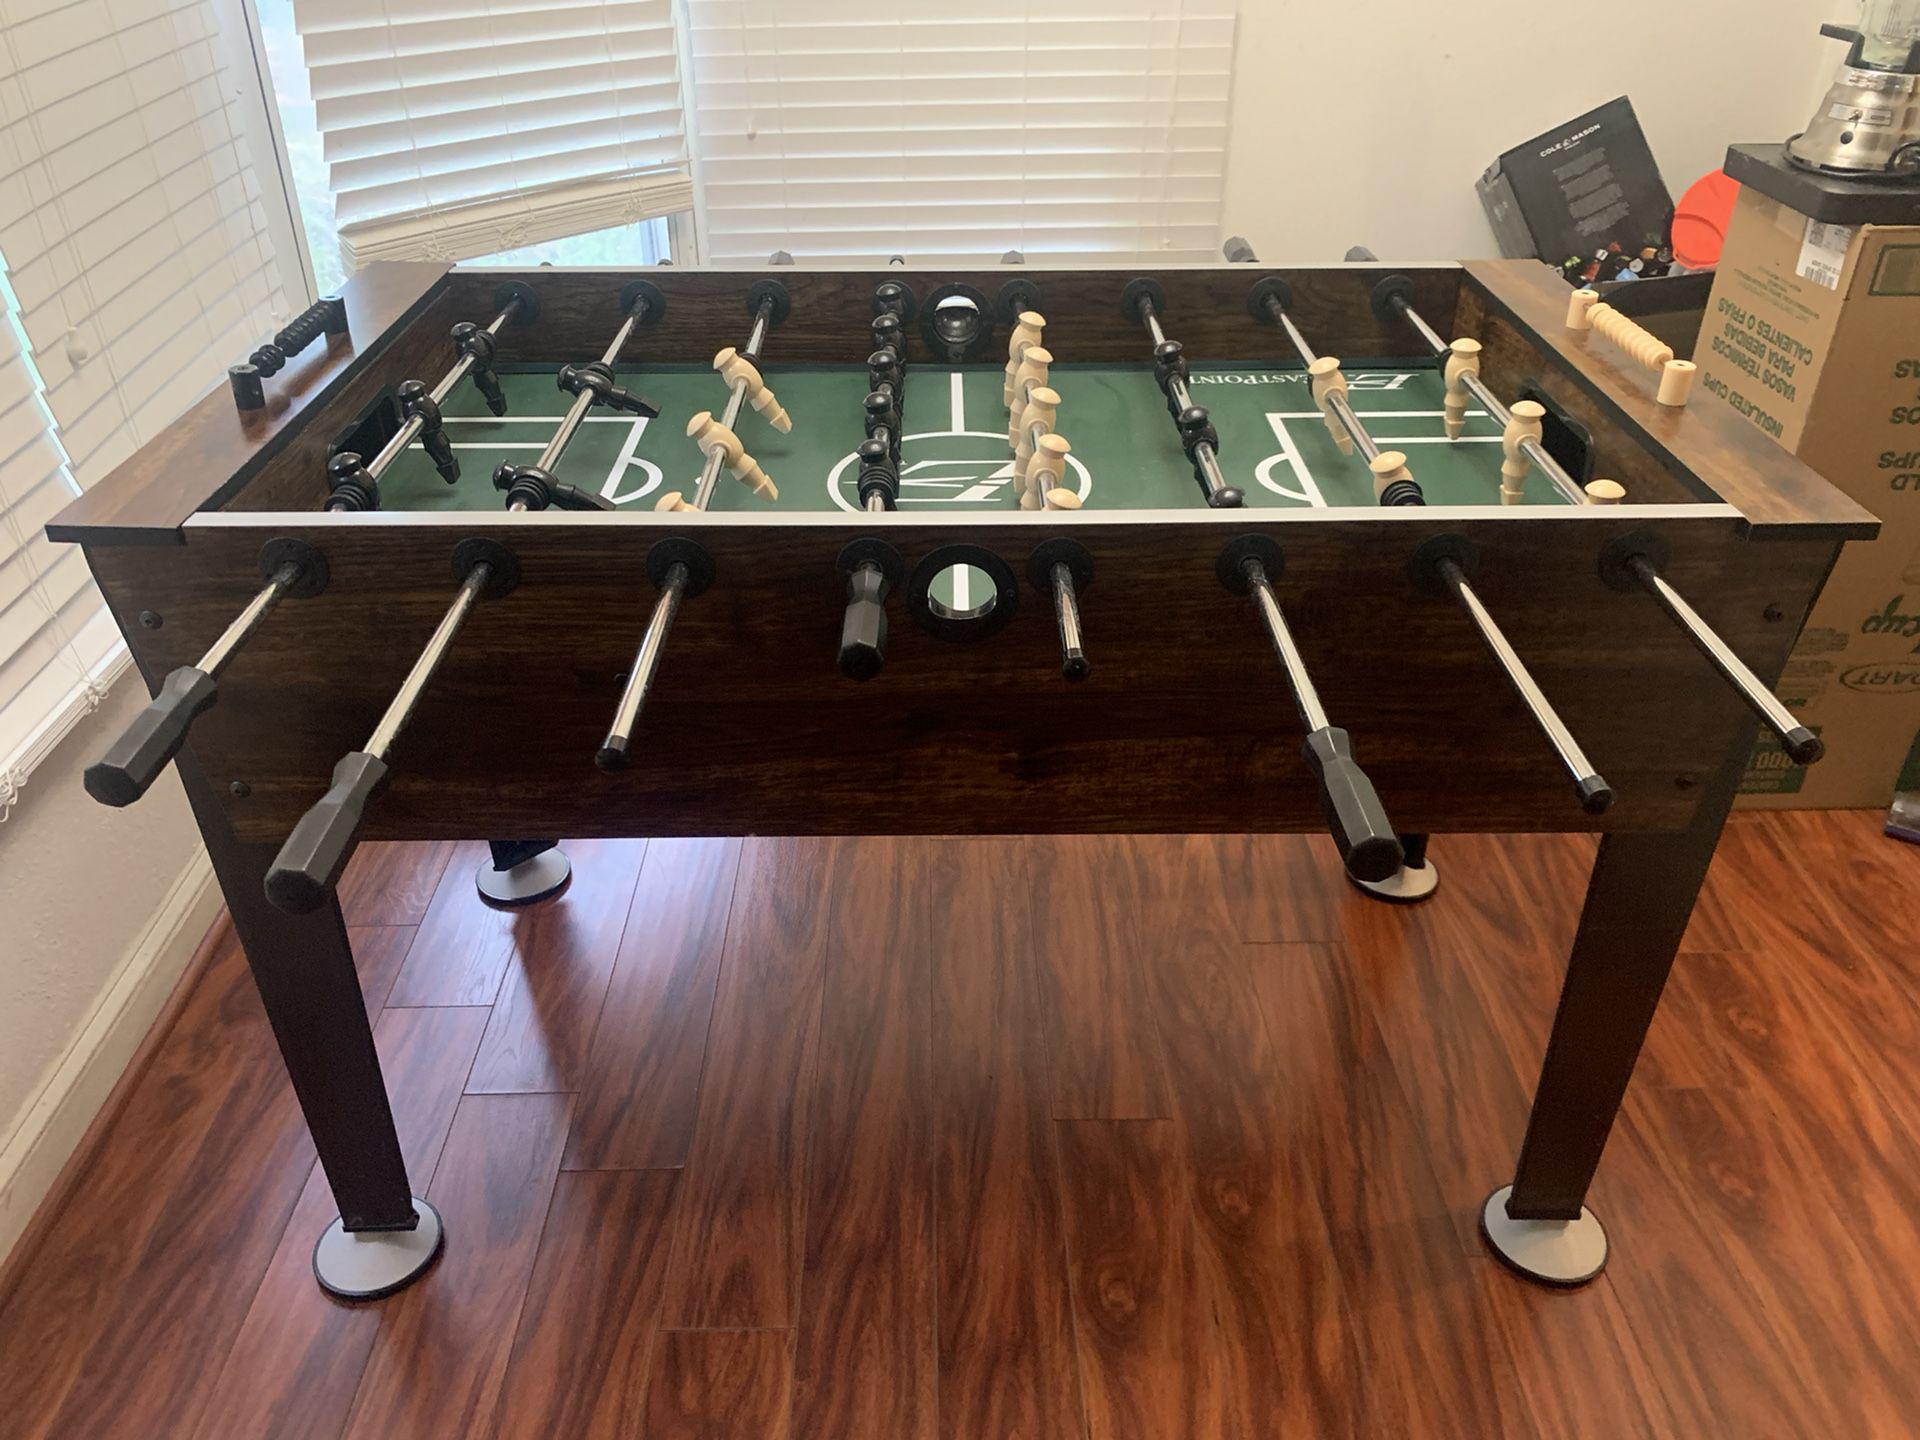 Eastpoint Fussball Table